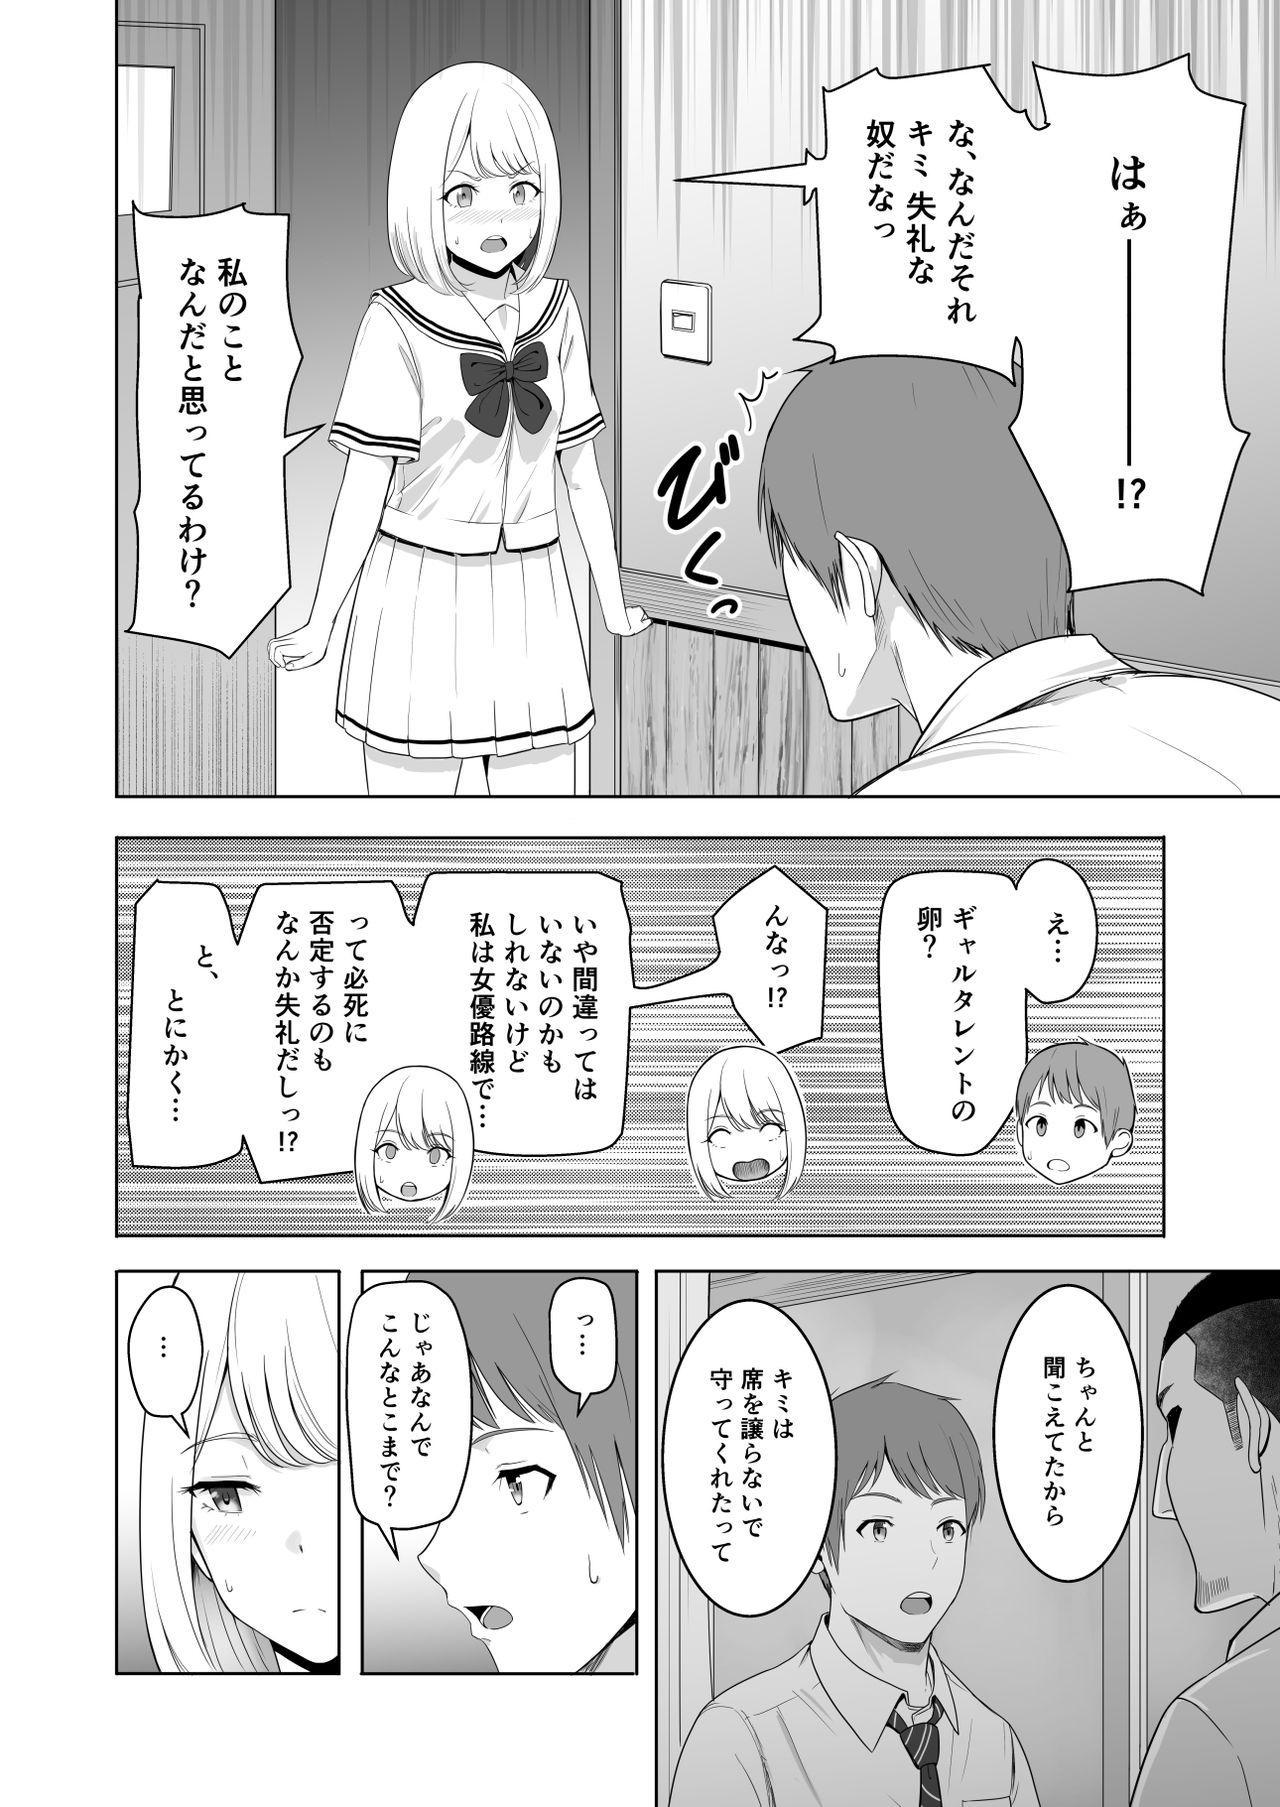 Kimi ga Tame. 2 Ichikawa Inori 18